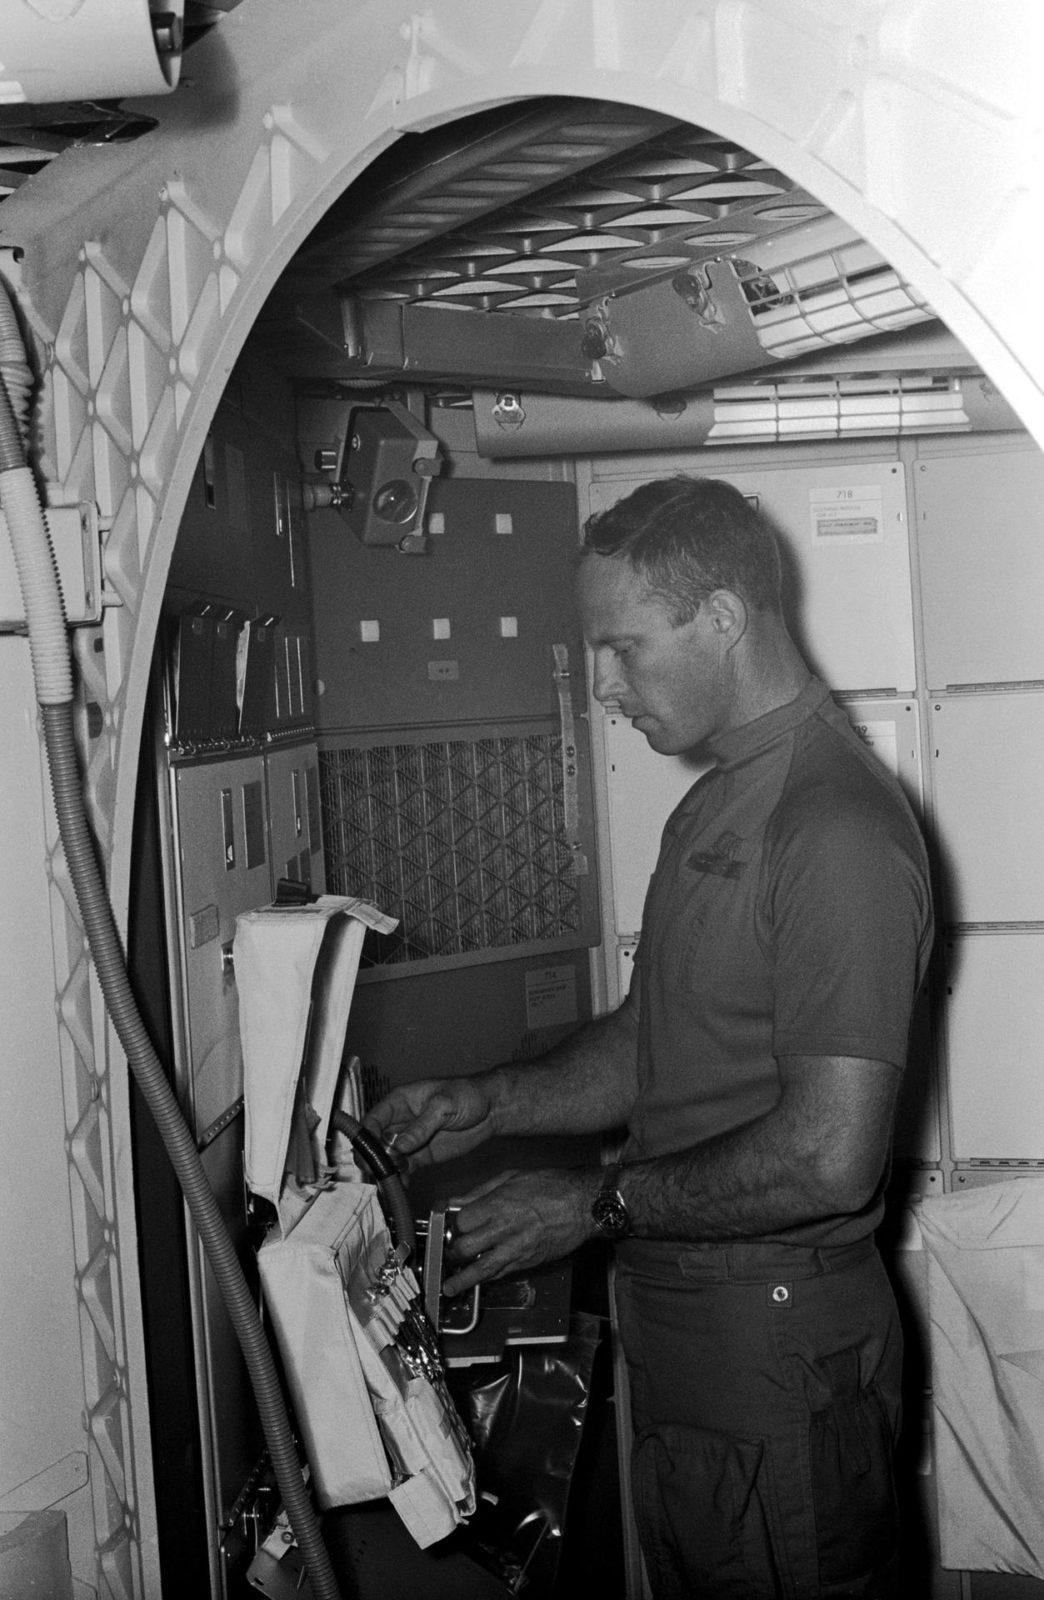 Astronaut Jack Lousma - Inflight Medical Support System (IMSS) - JSC